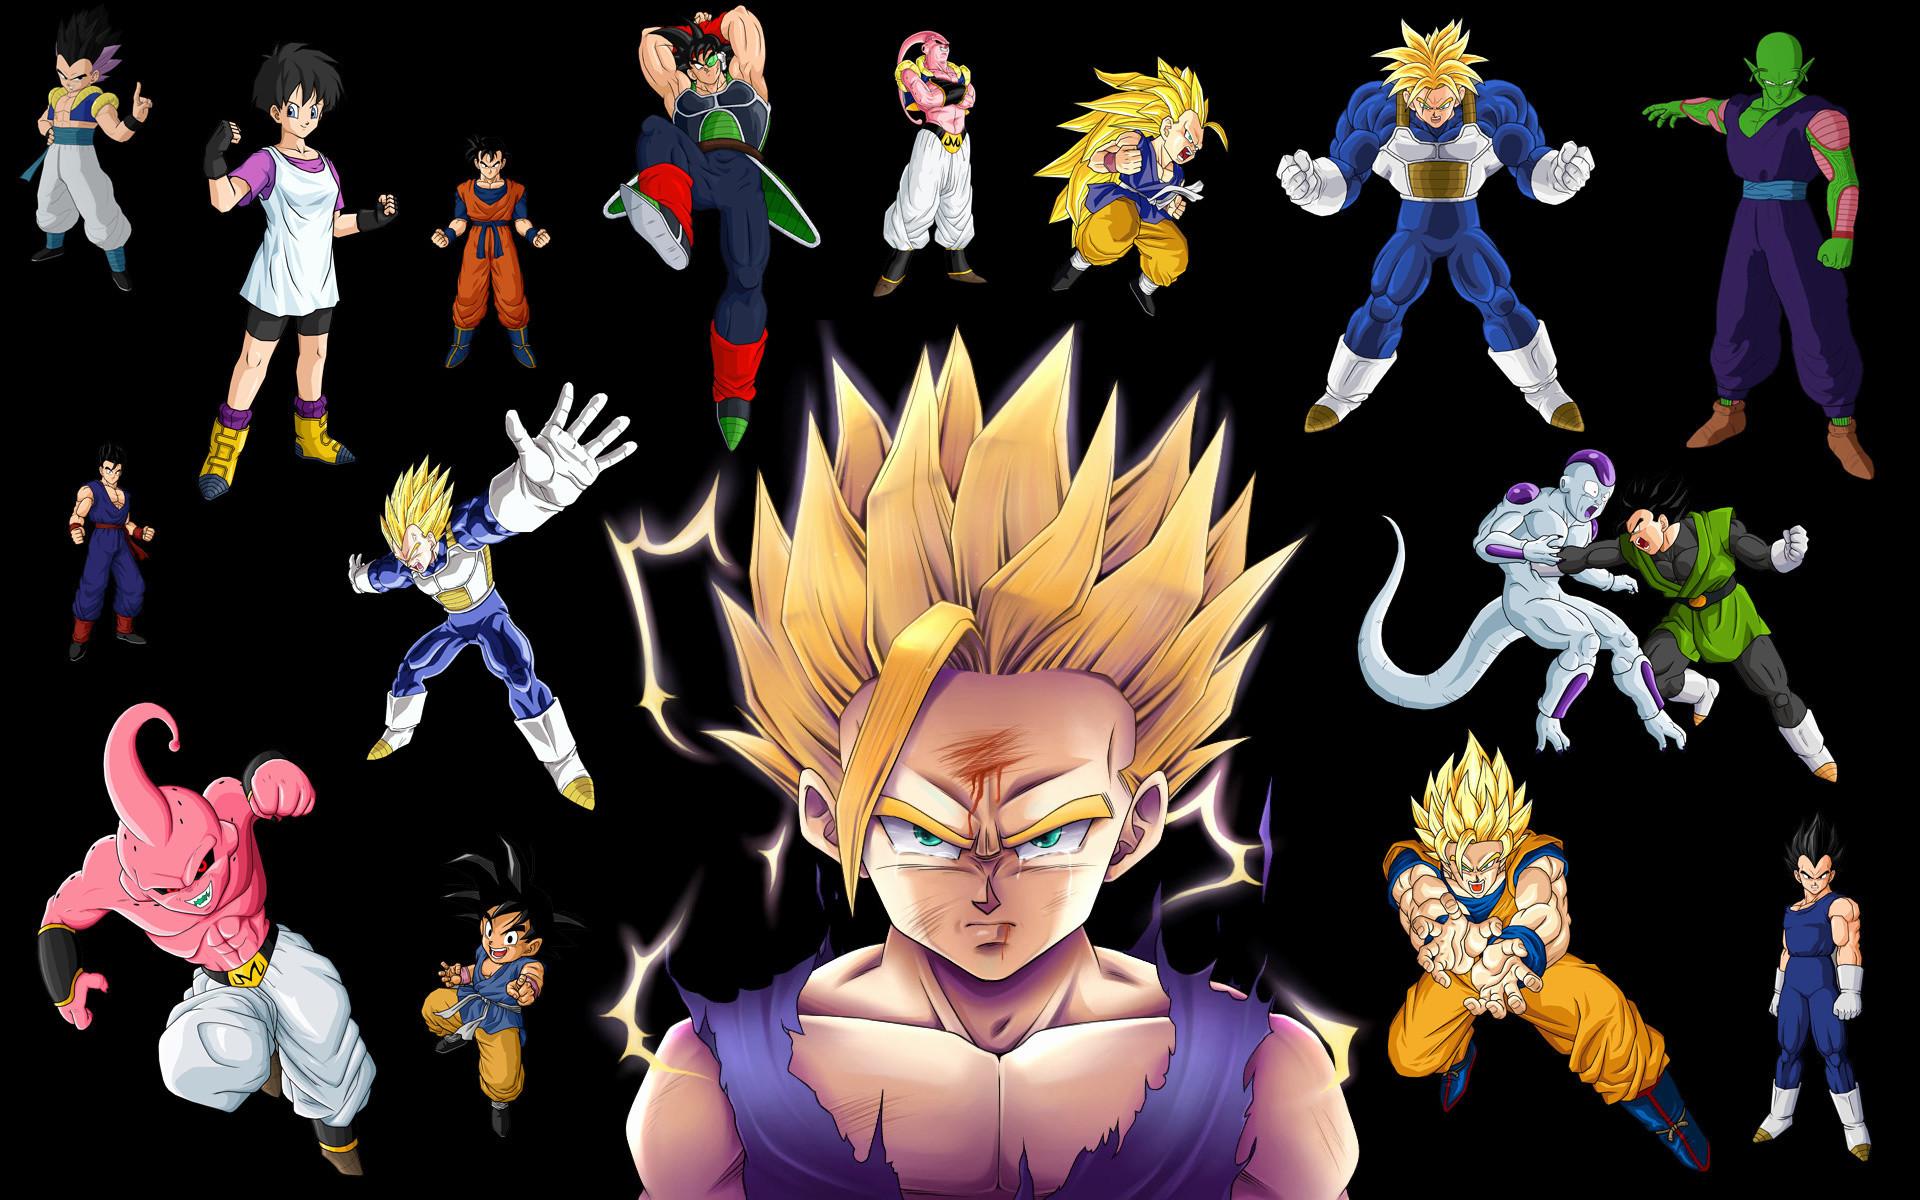 Res: 1920x1200, 1920x1080 Goku vs Buu Wallpaper by Billysan291 Goku vs Buu Wallpaper by  Billysan291